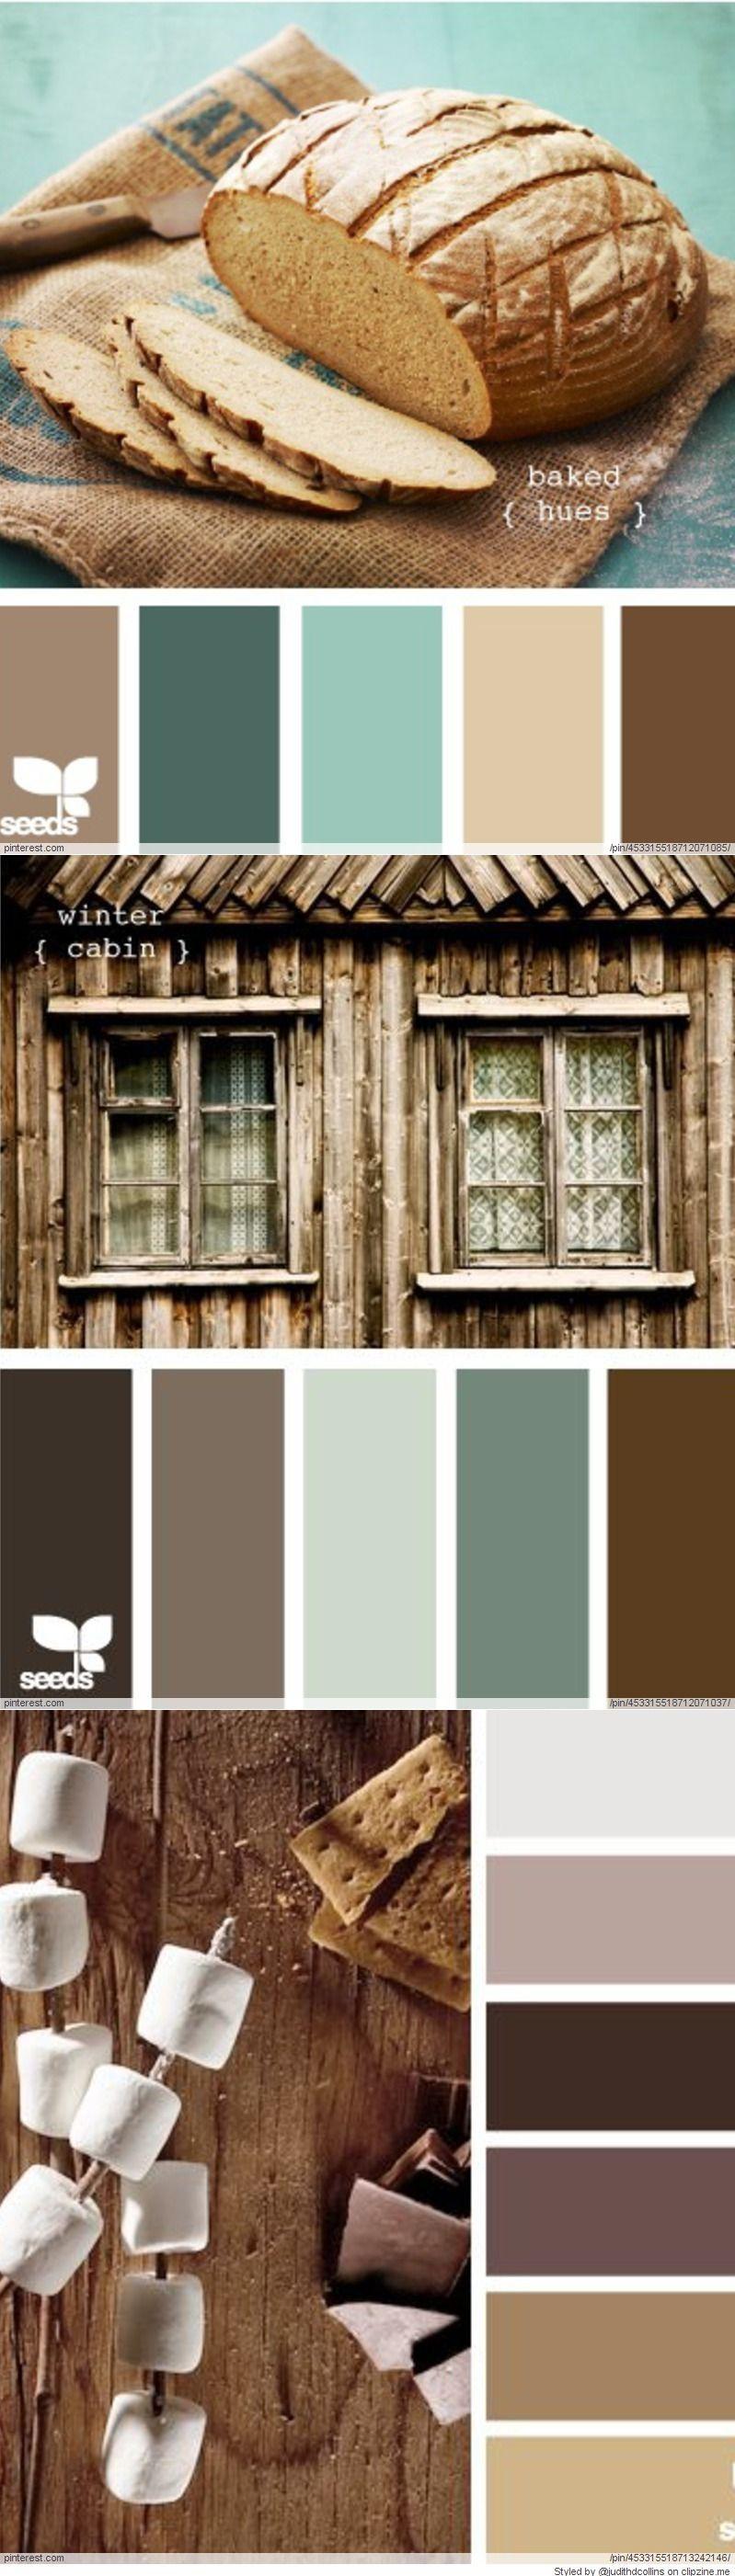 Great Best 25+ Rustic Color Palettes Ideas On Pinterest   Rustic Paint Colors, Rustic  Colors And Behr Paint Part 14